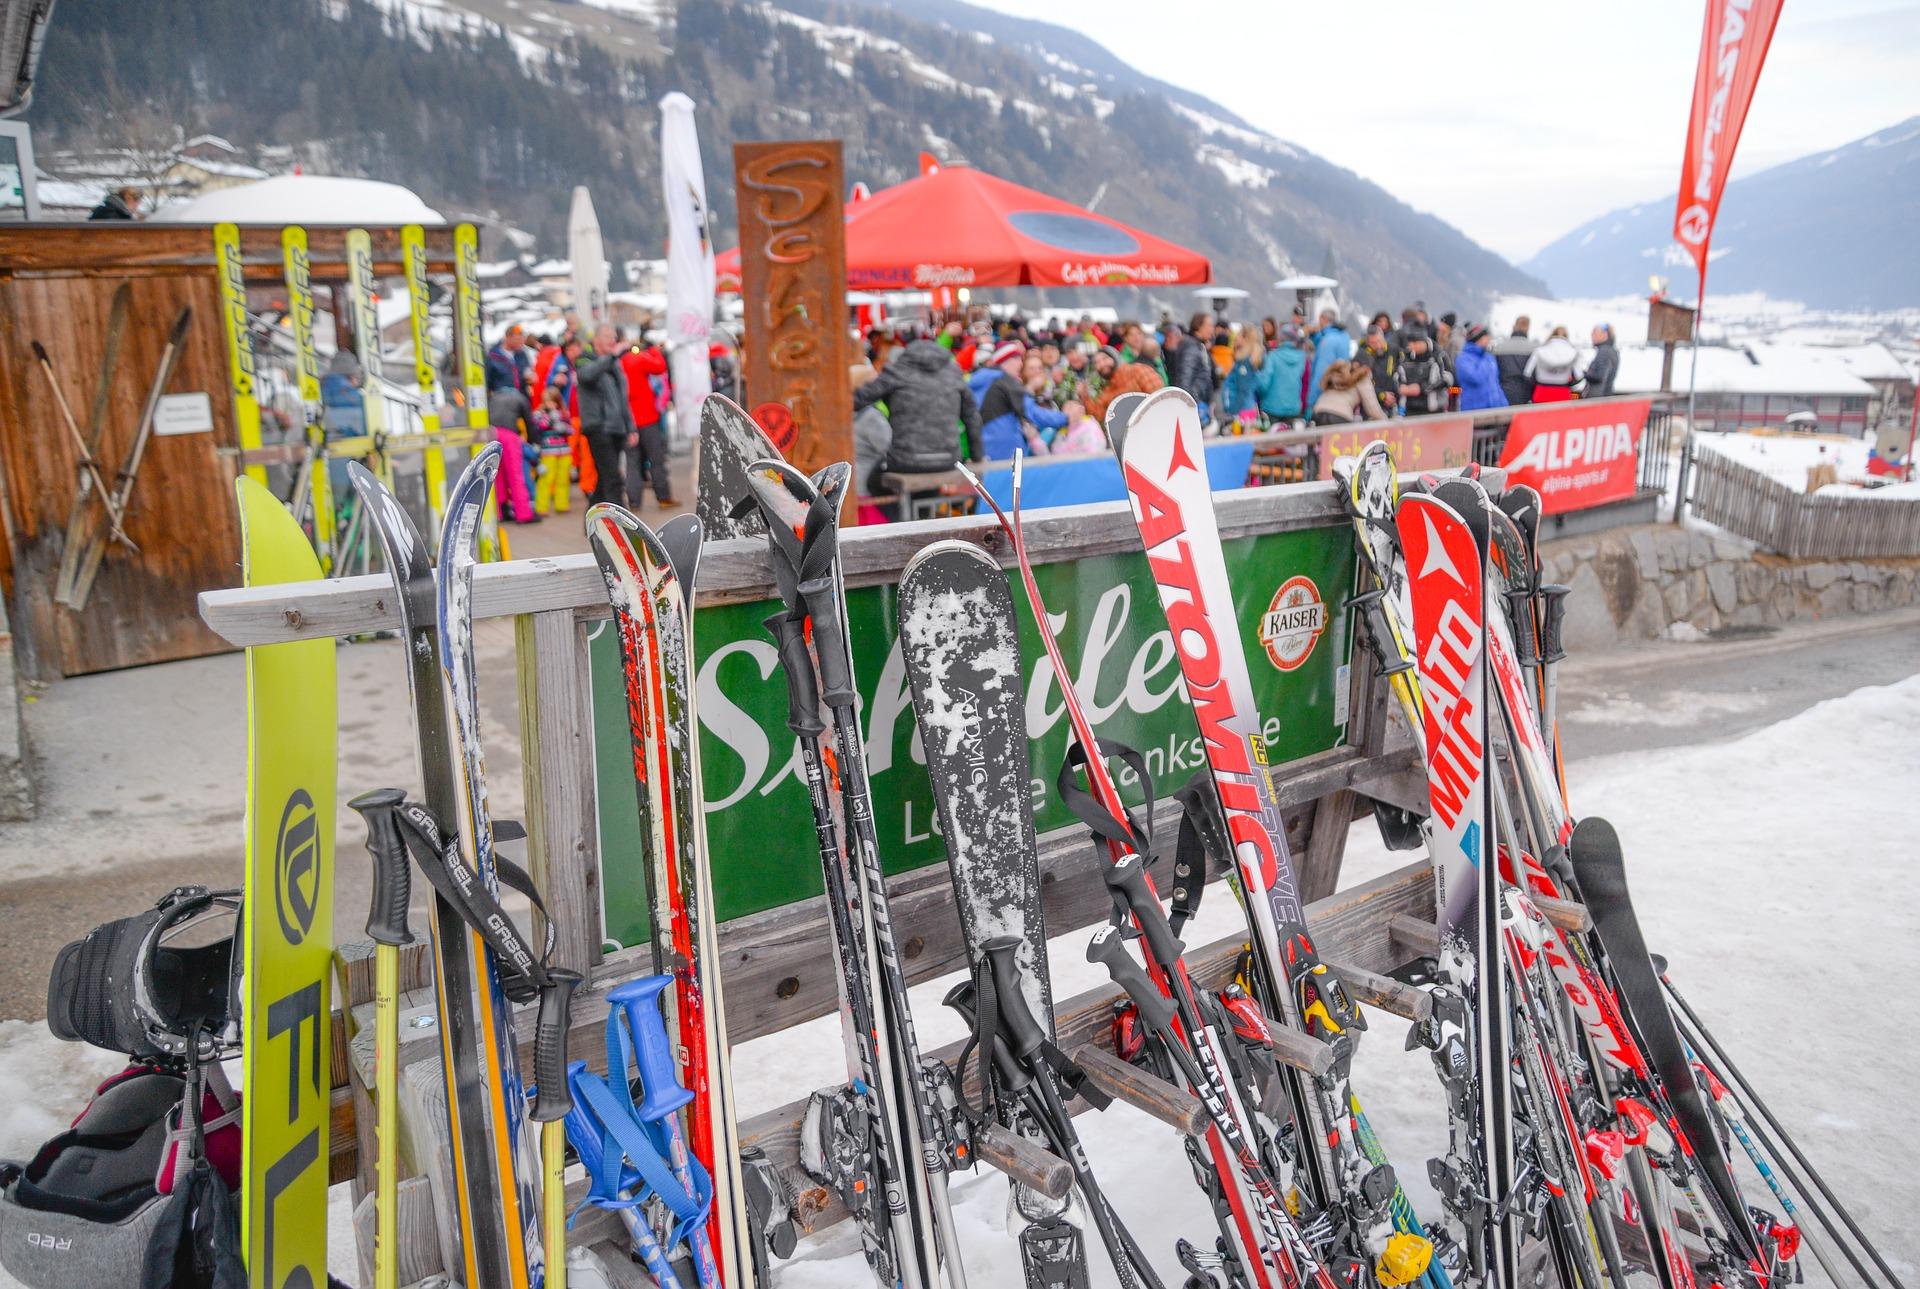 Einladung zur Après-Ski-Party